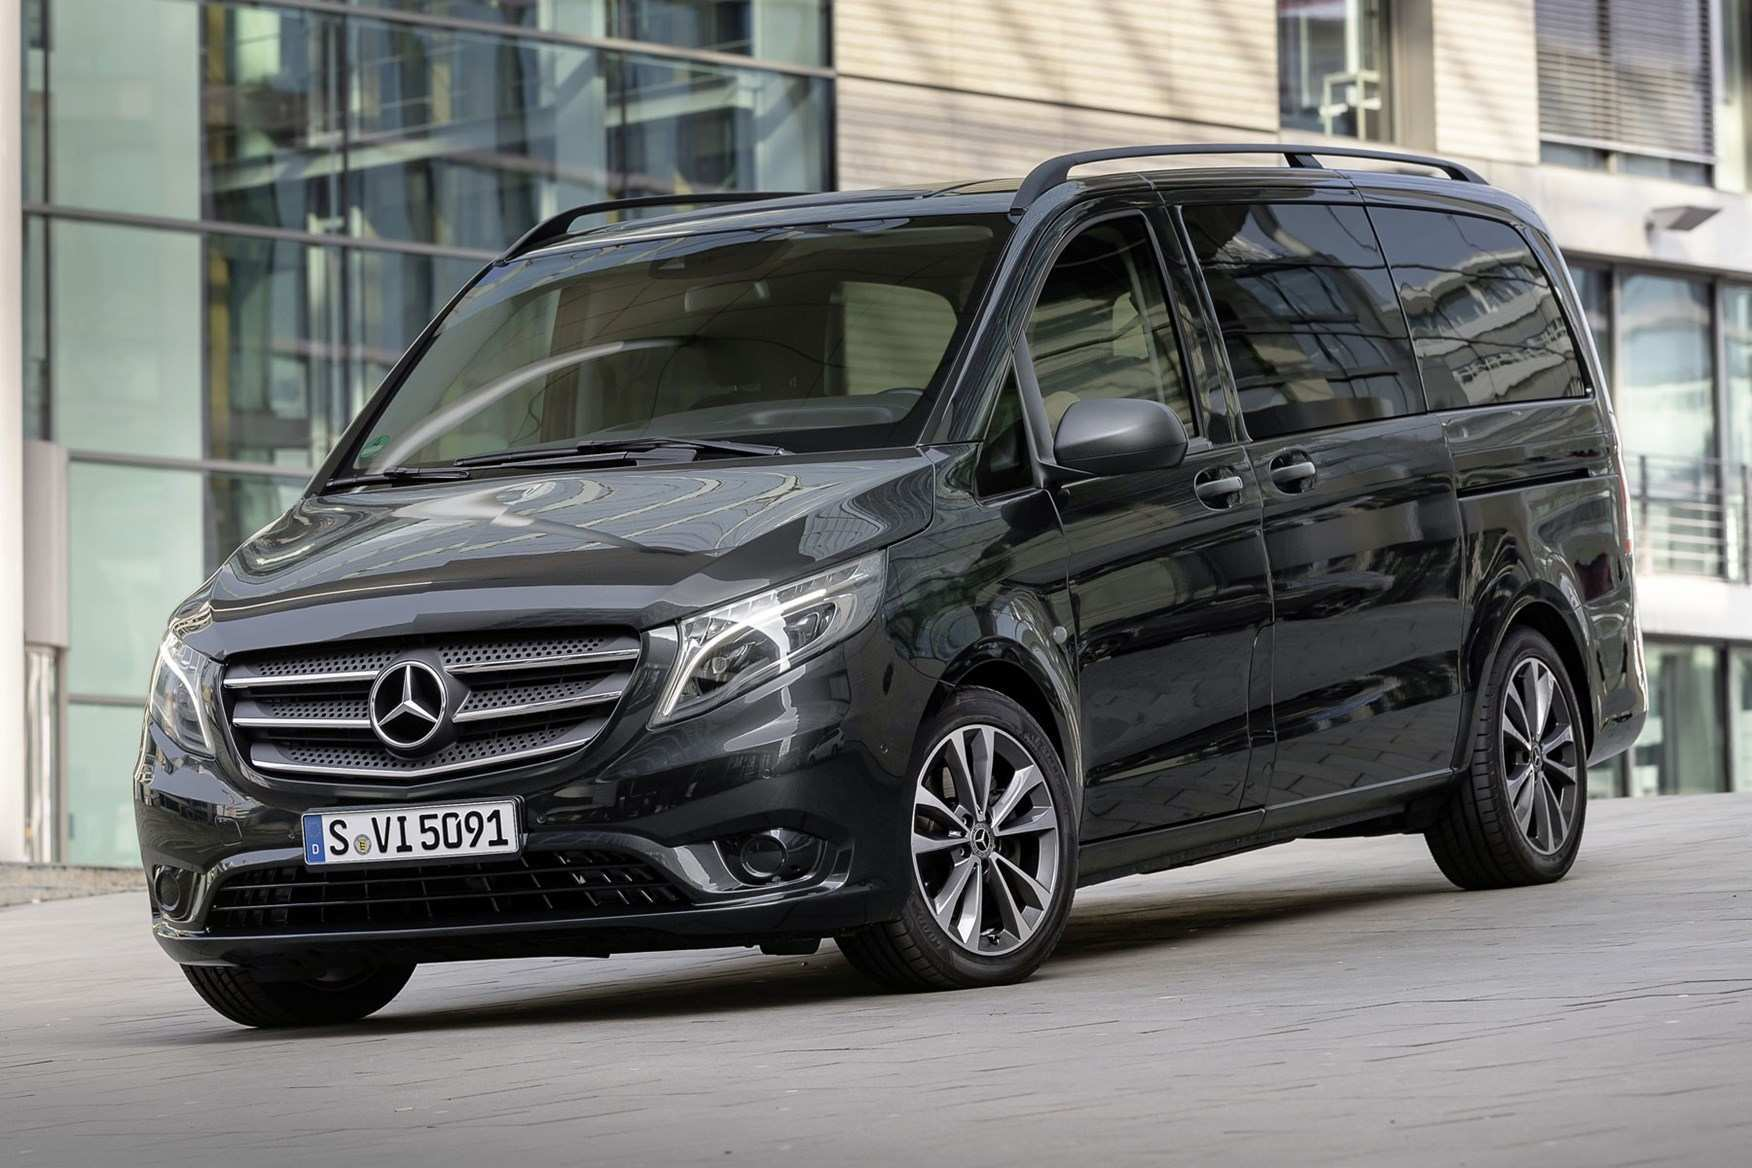 66 The Mercedes Vito 2019 Prices for Mercedes Vito 2019